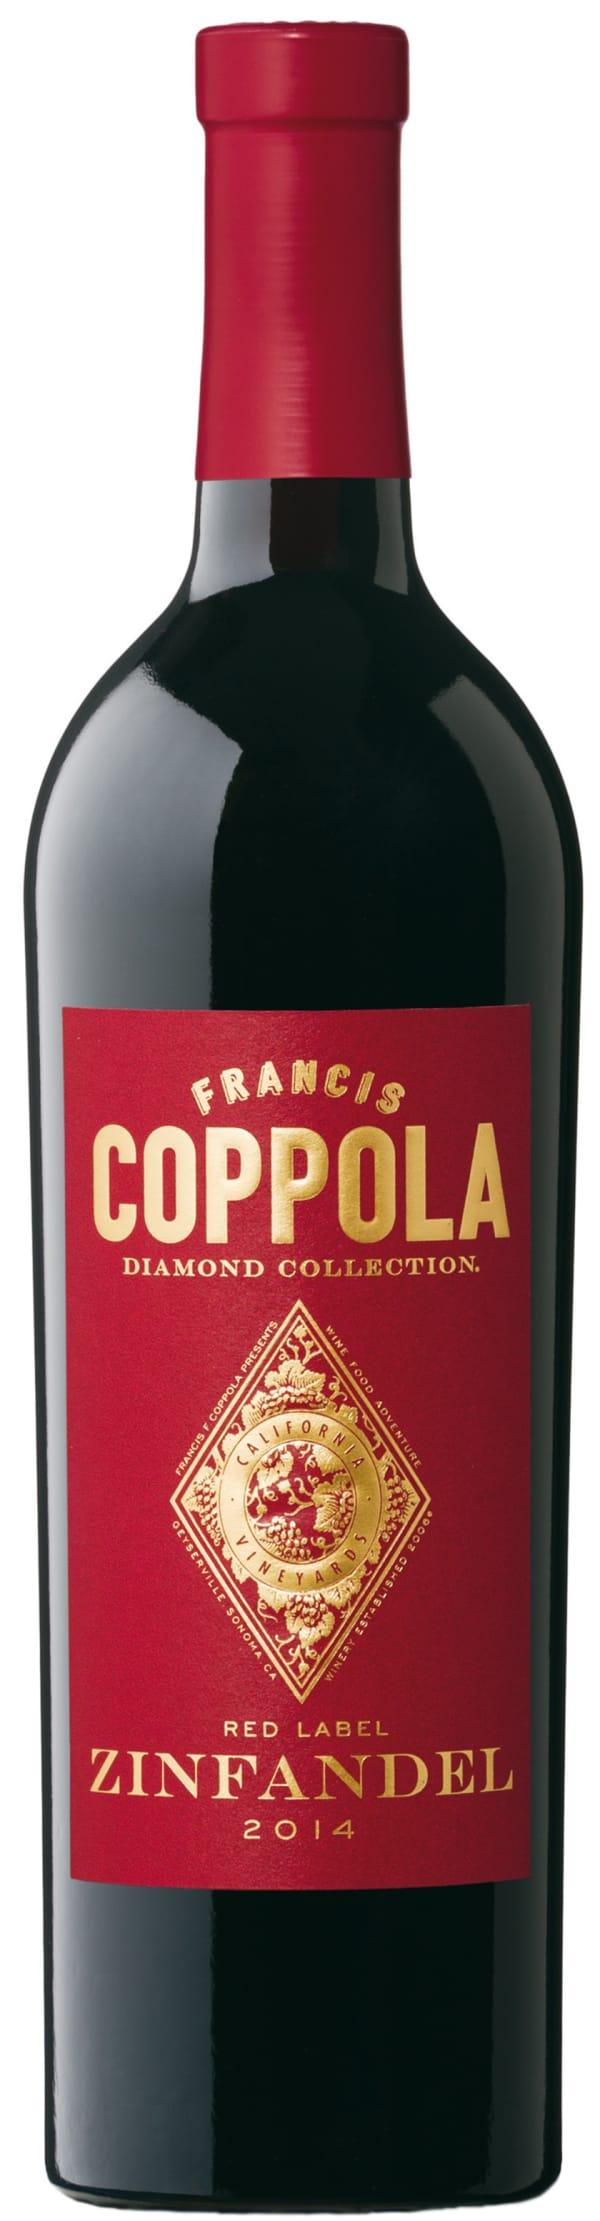 Coppola Diamond Collection Zinfandel 2016